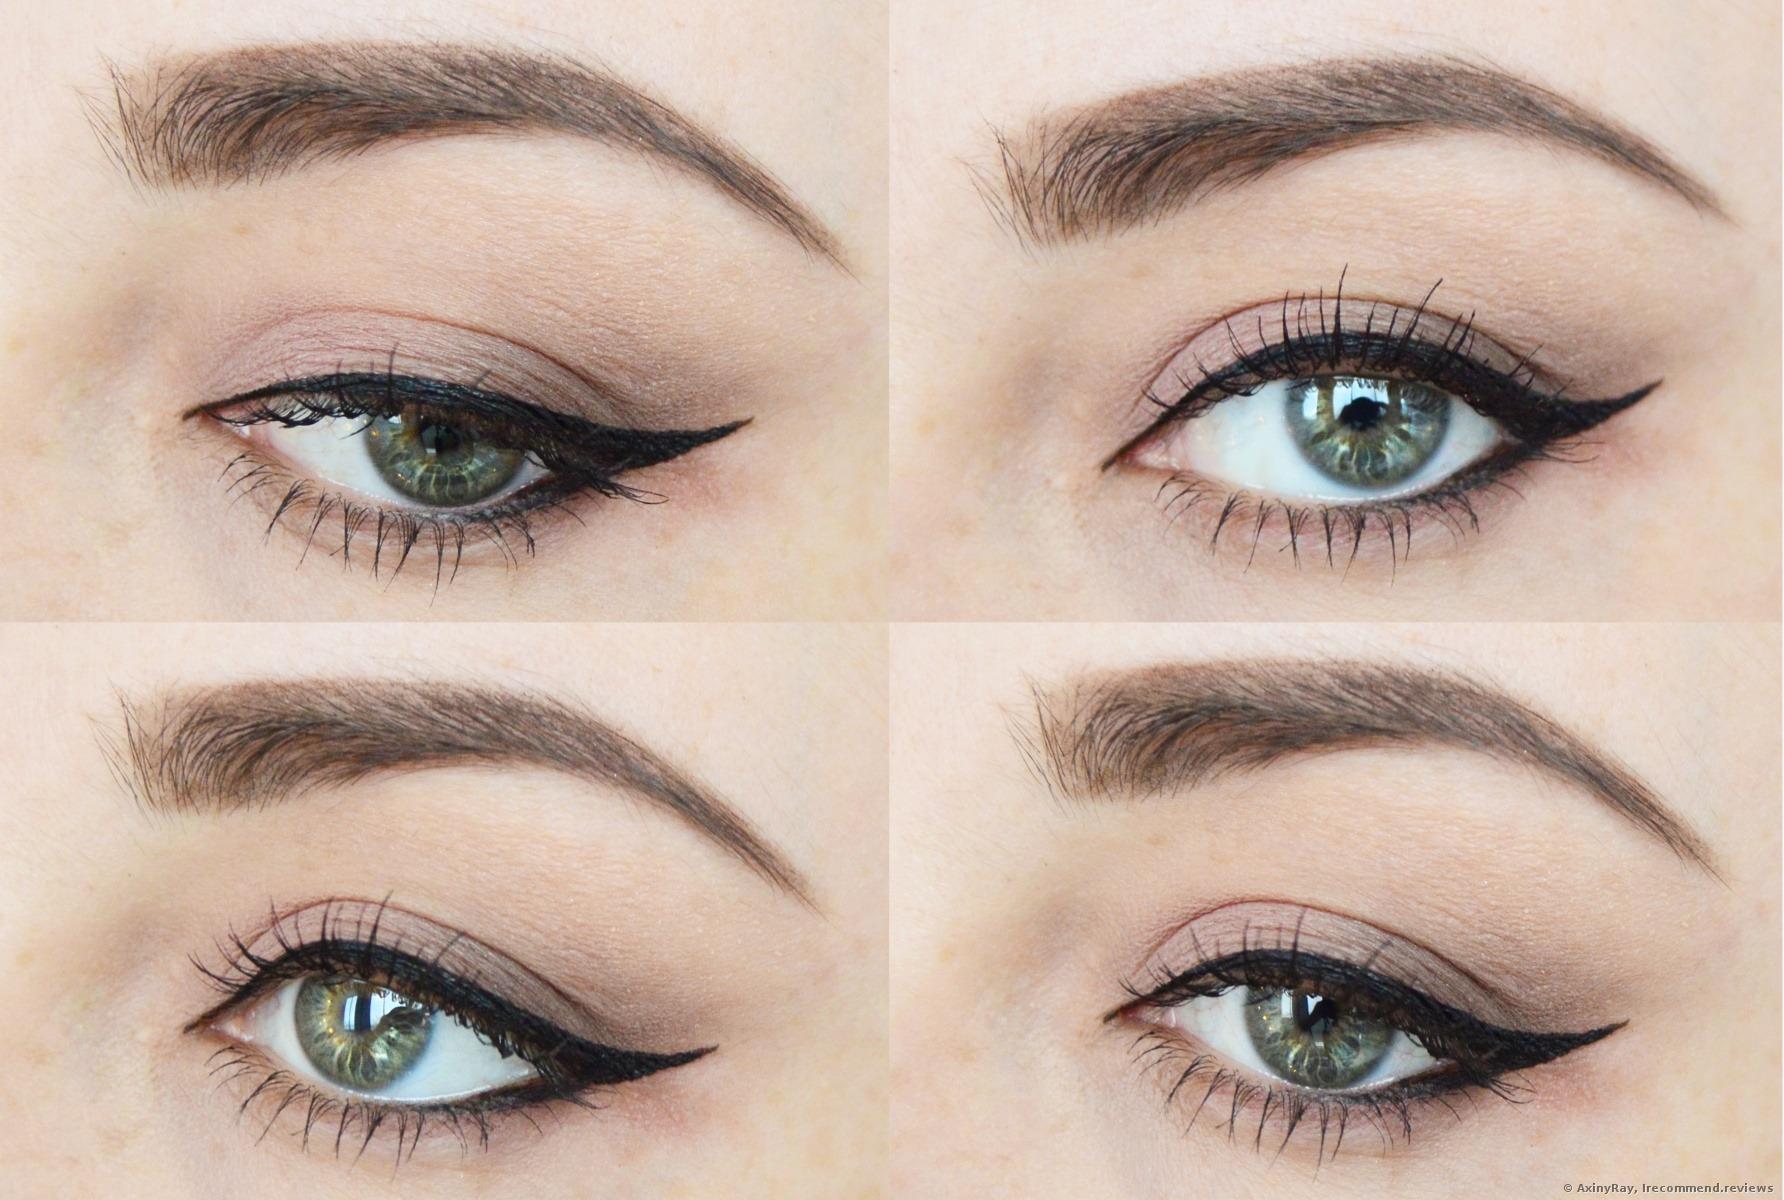 b2b58fa3fa1 Maybelline Curvitude Liner Eyeliner - «NEW eyeliner from Maybelline ...